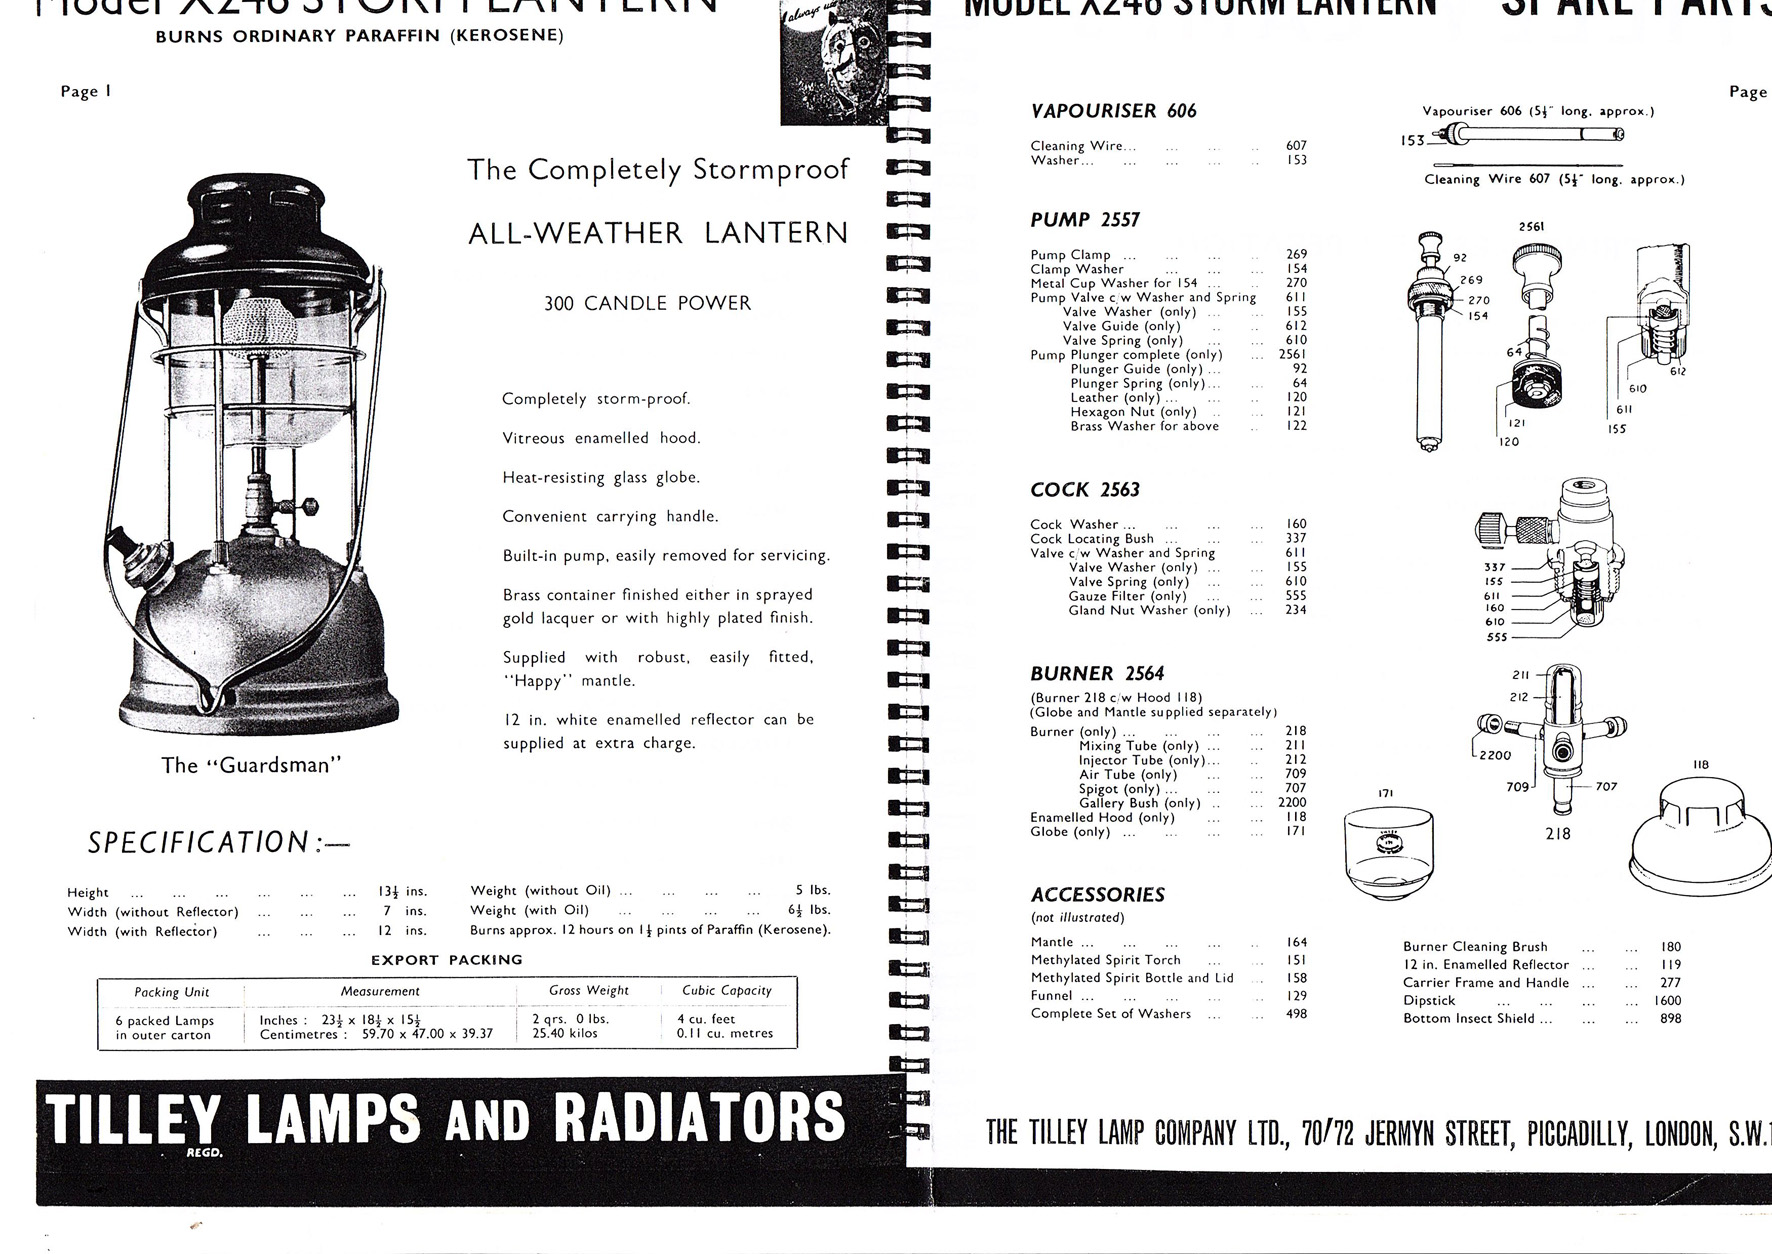 Parts For Tilley X246 Pre 1960